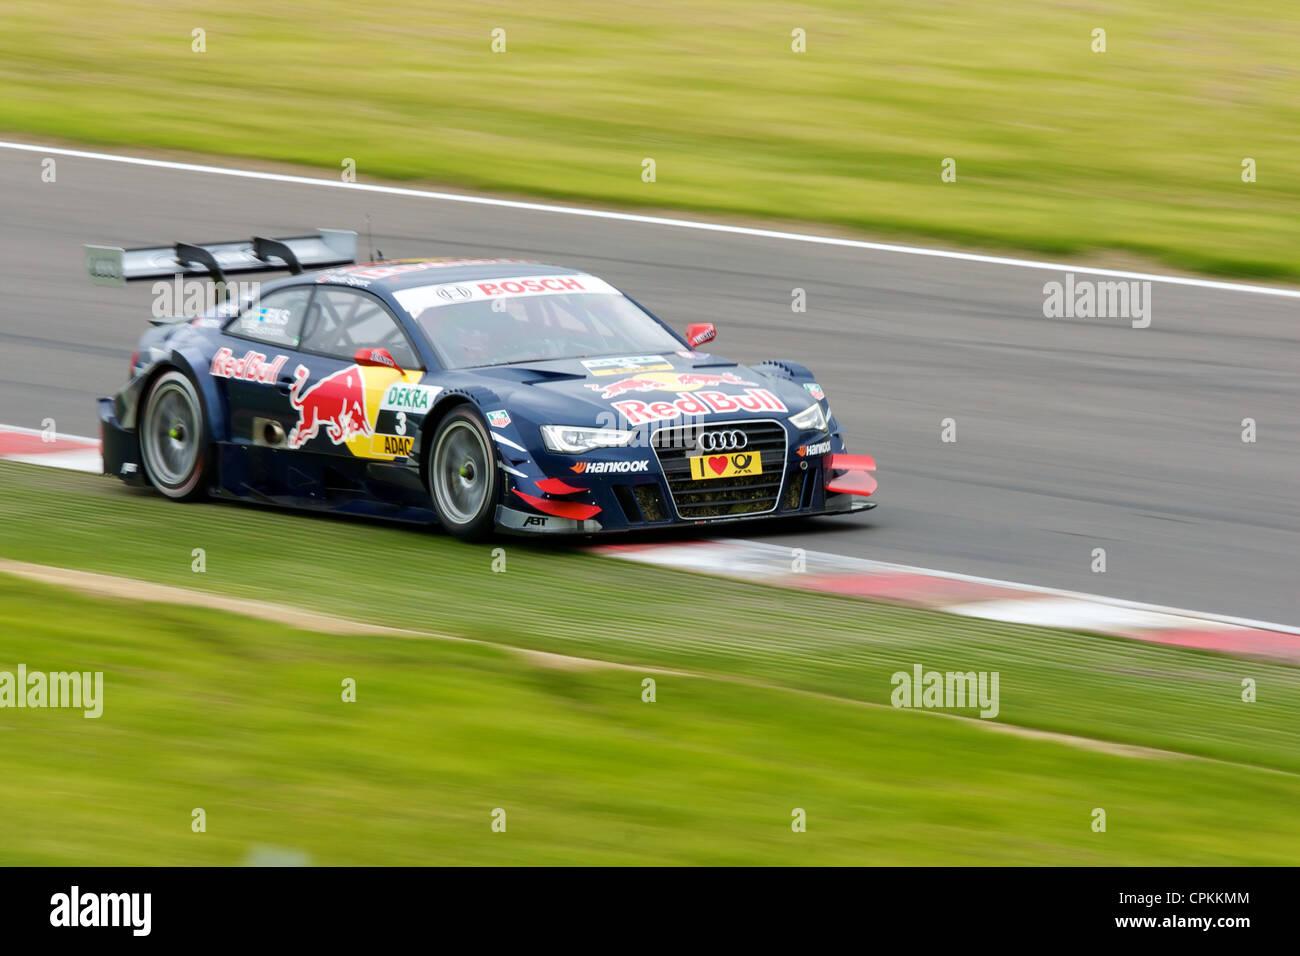 Mattias Ekstrom in an Audi DTM car at Brands Hatch 2012 - Stock Image